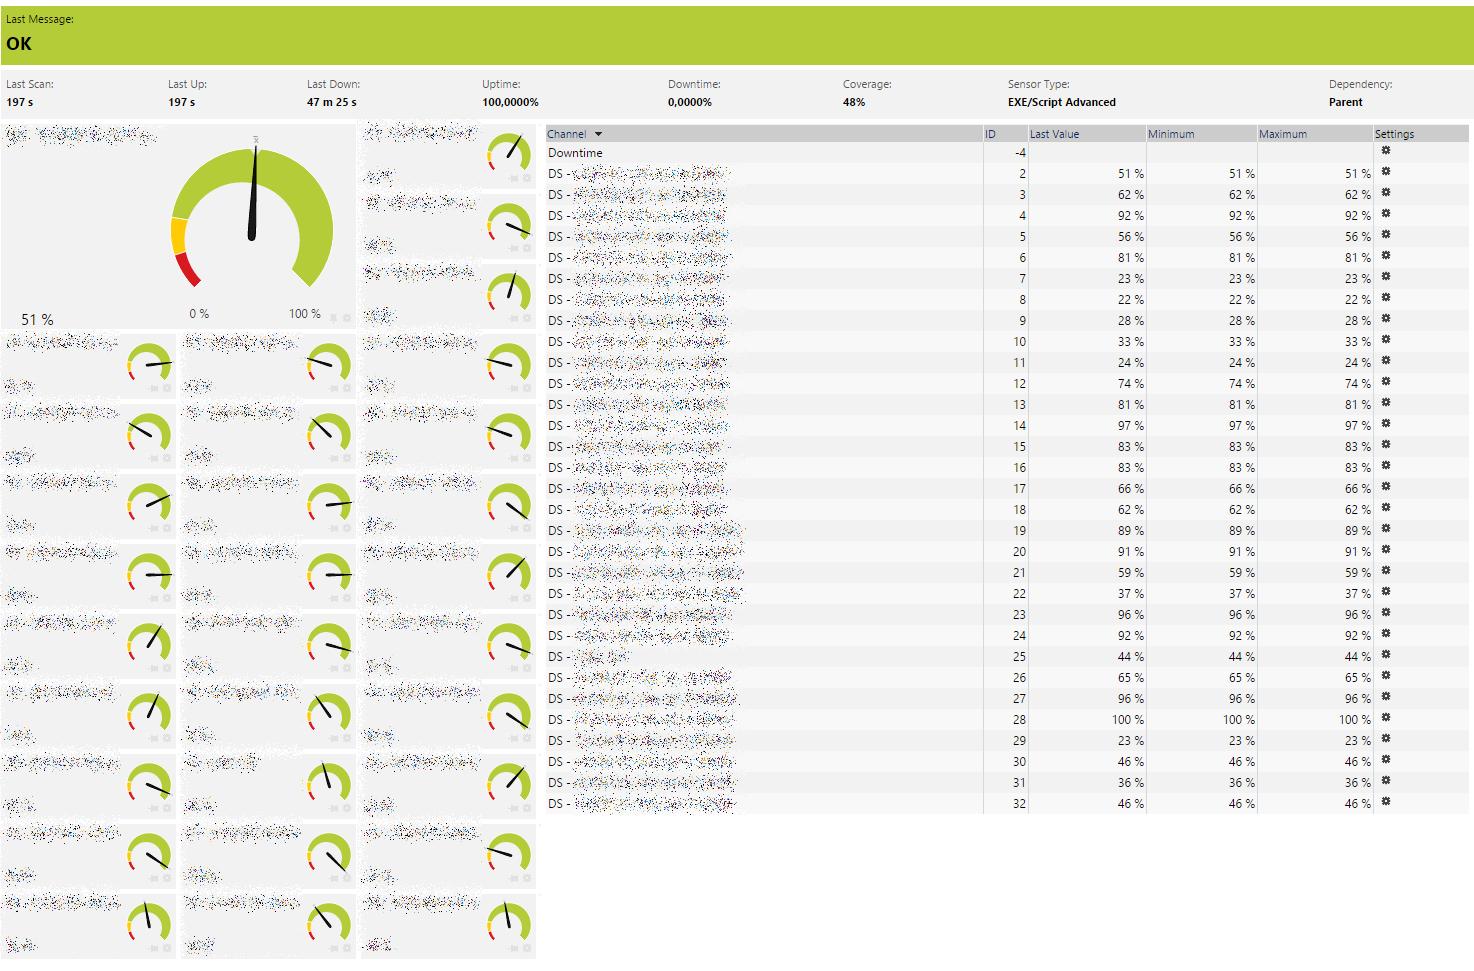 vCenter PRTG Sensor - Datastore Nutzung